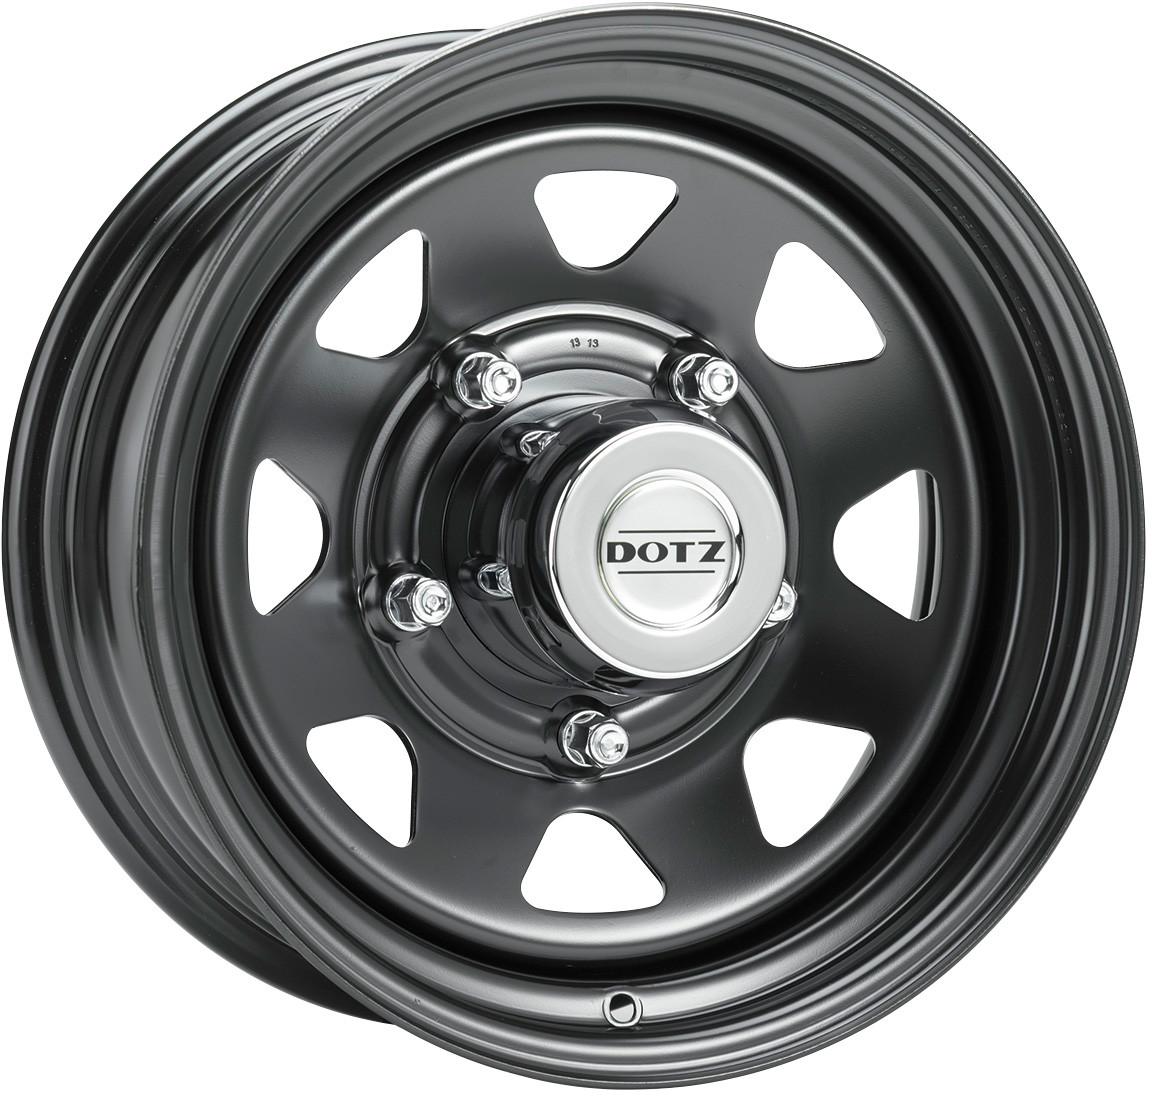 DOTZ 4X4 4X4 Dakar Dark 7.00 x 16 6 x 139.7 ET 13